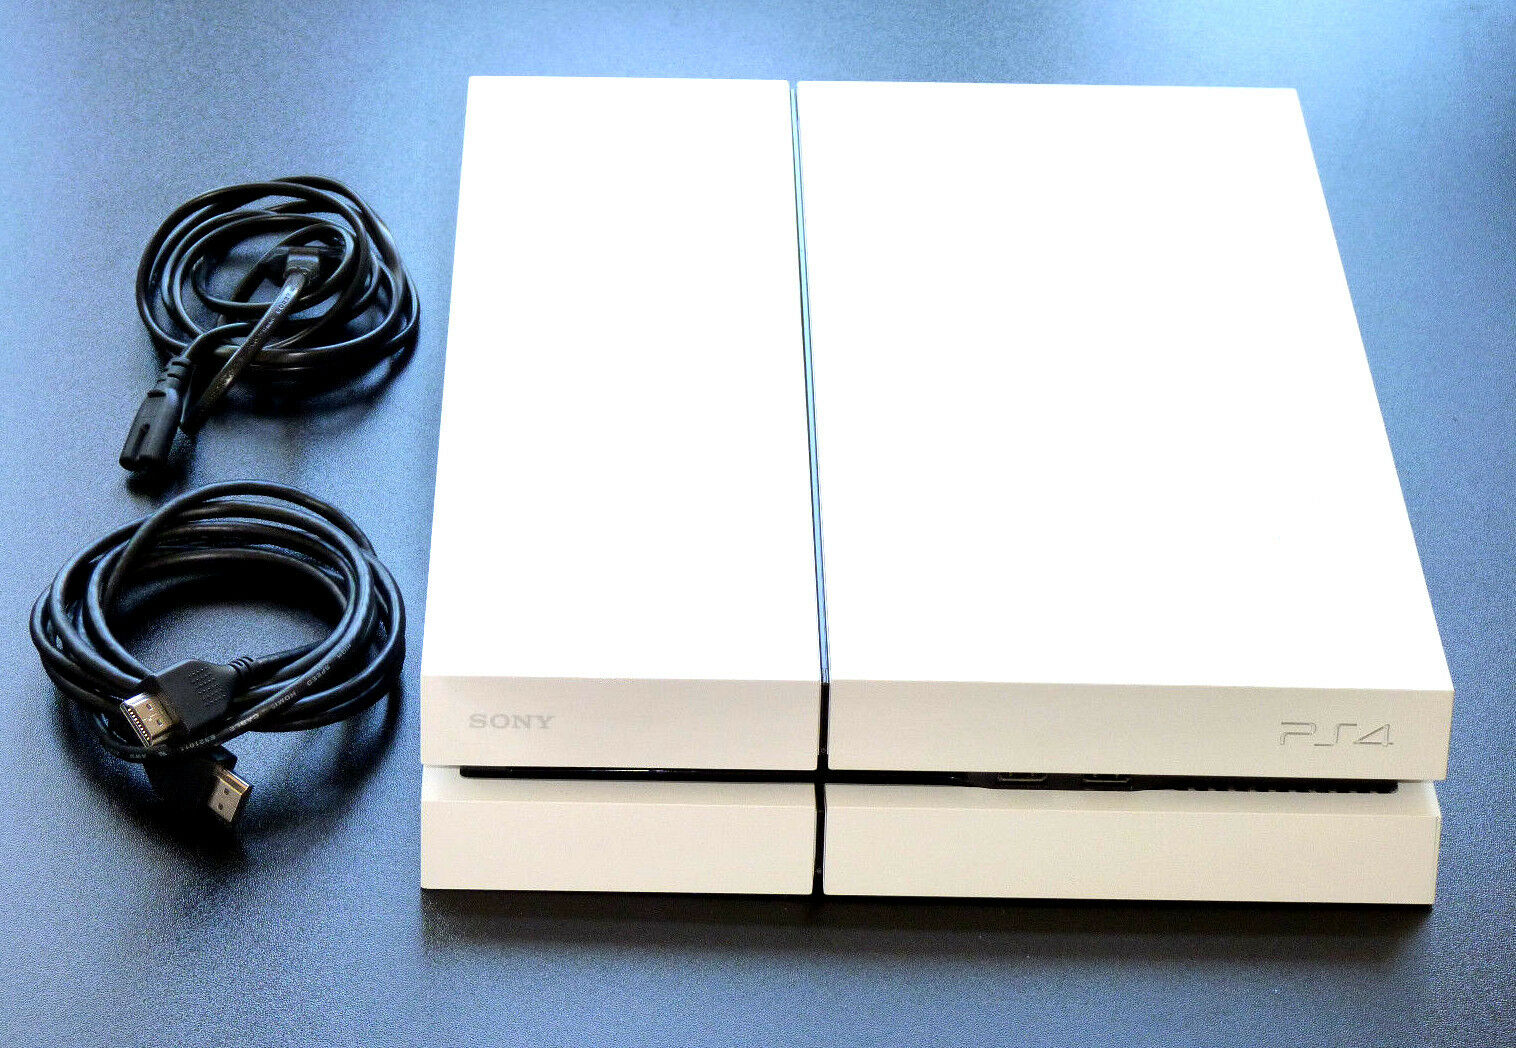 PLAYSTATION 4 KONSOLE 500GB EDITION WEISS + KABEL + HDMI PS4 white 500 GB weiß